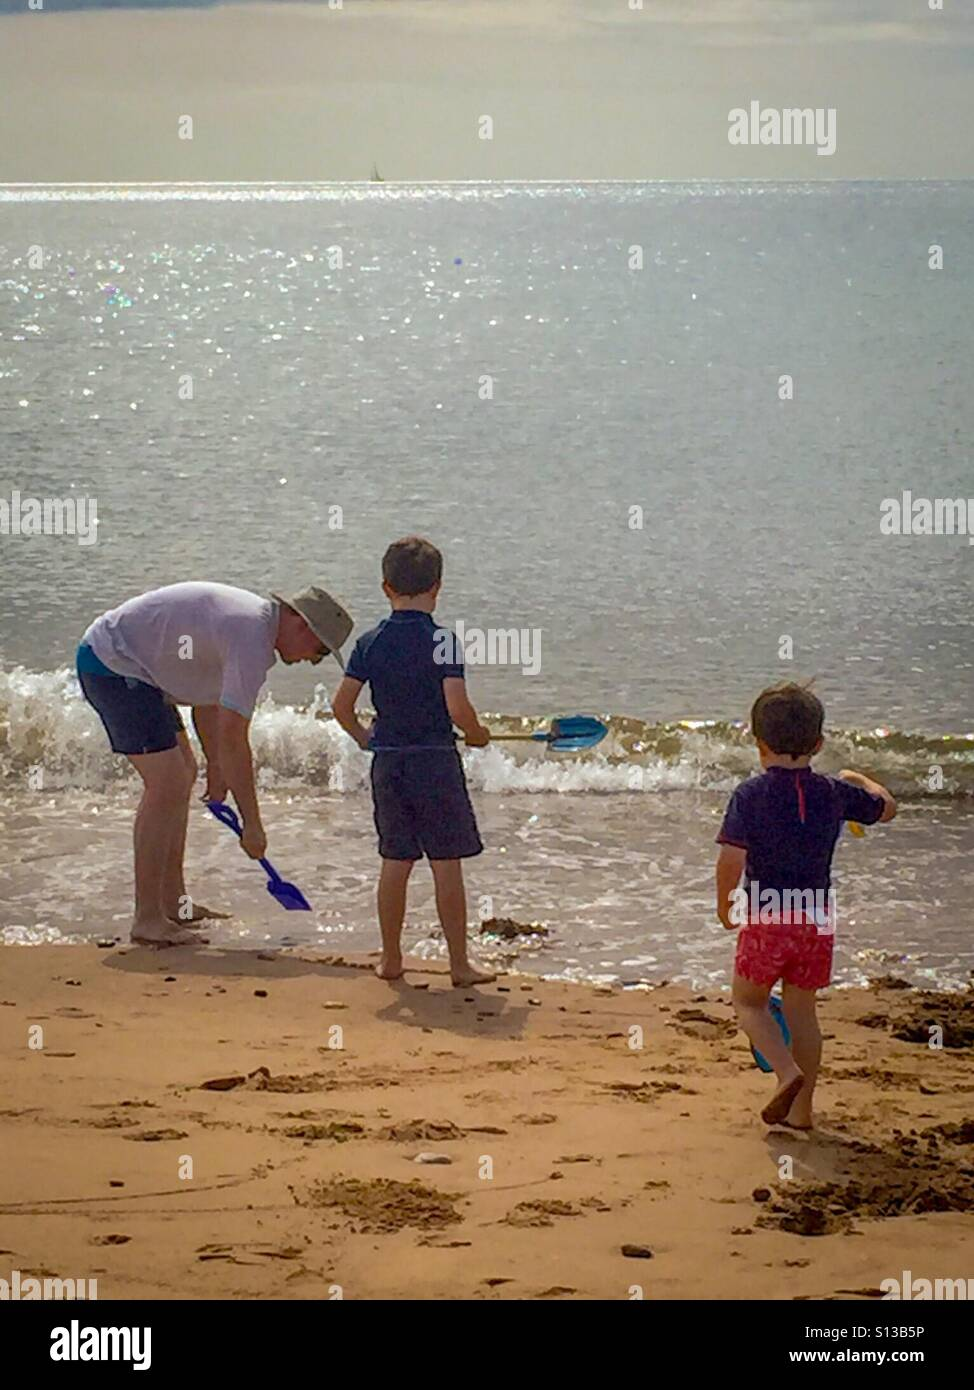 a-family-playing-on-the-beach-at-dawlish-warren-in-devon-uk-S13B5P.jpg